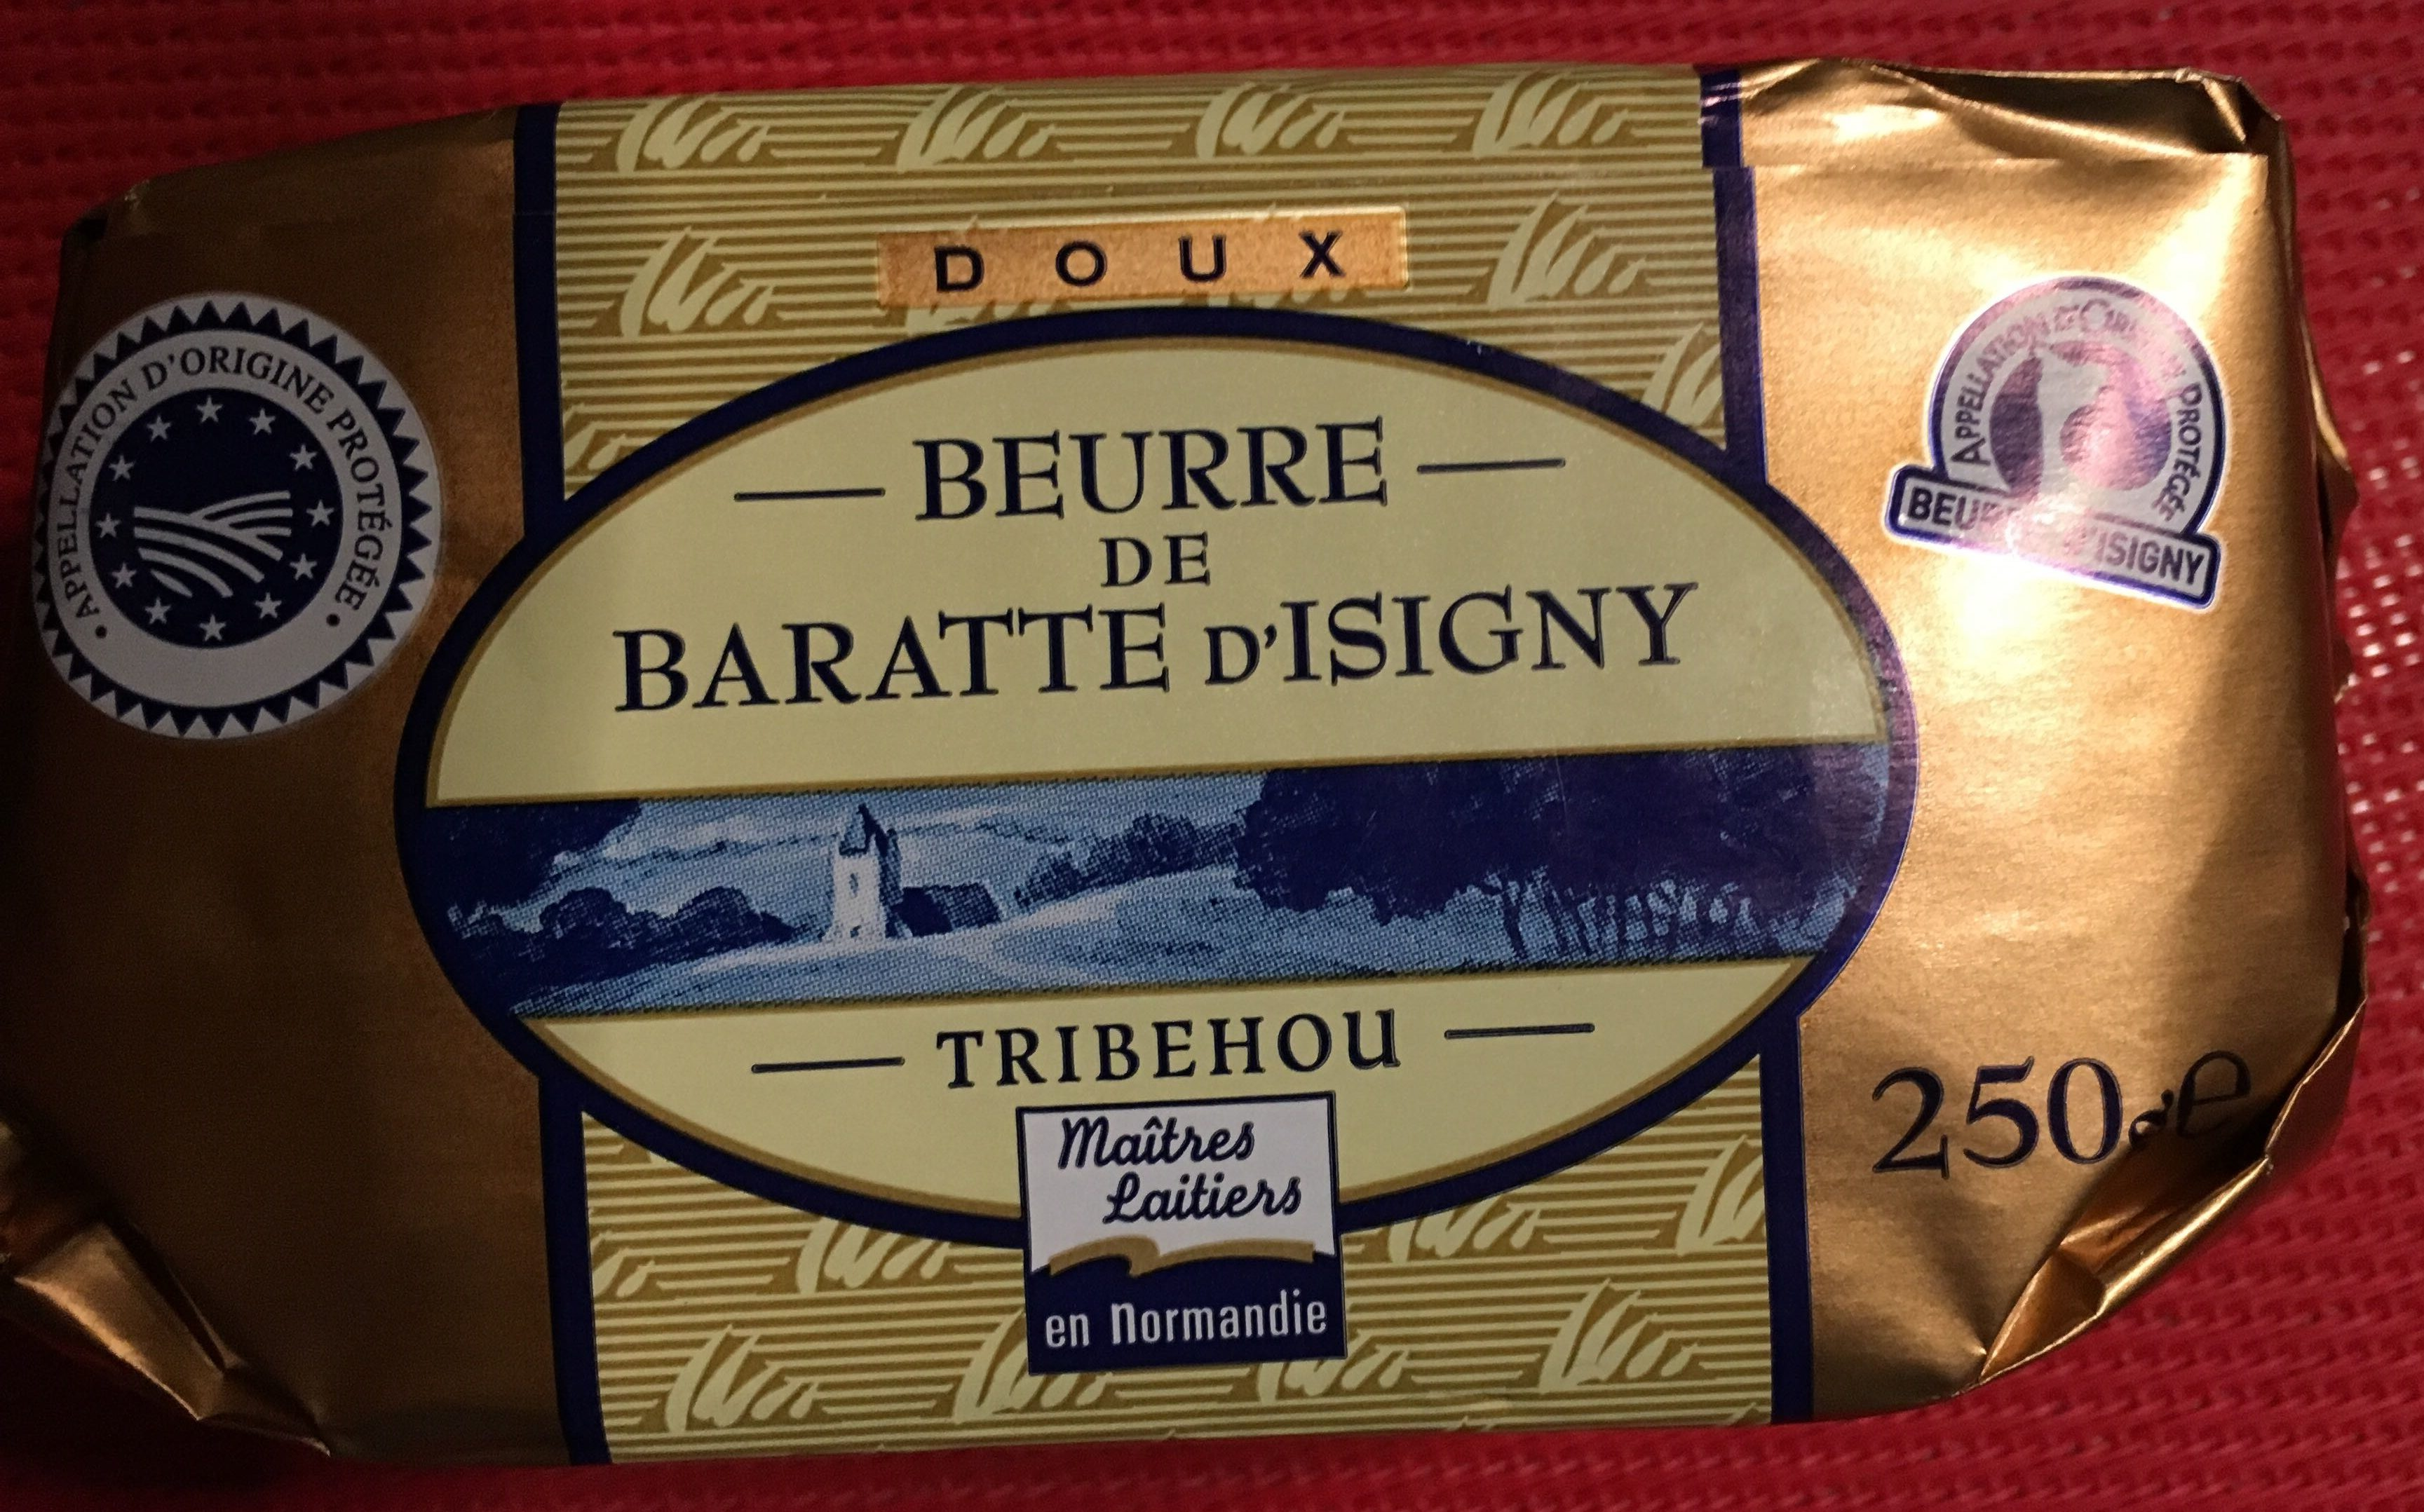 Beurre de baratte d'Isigny - Product - fr